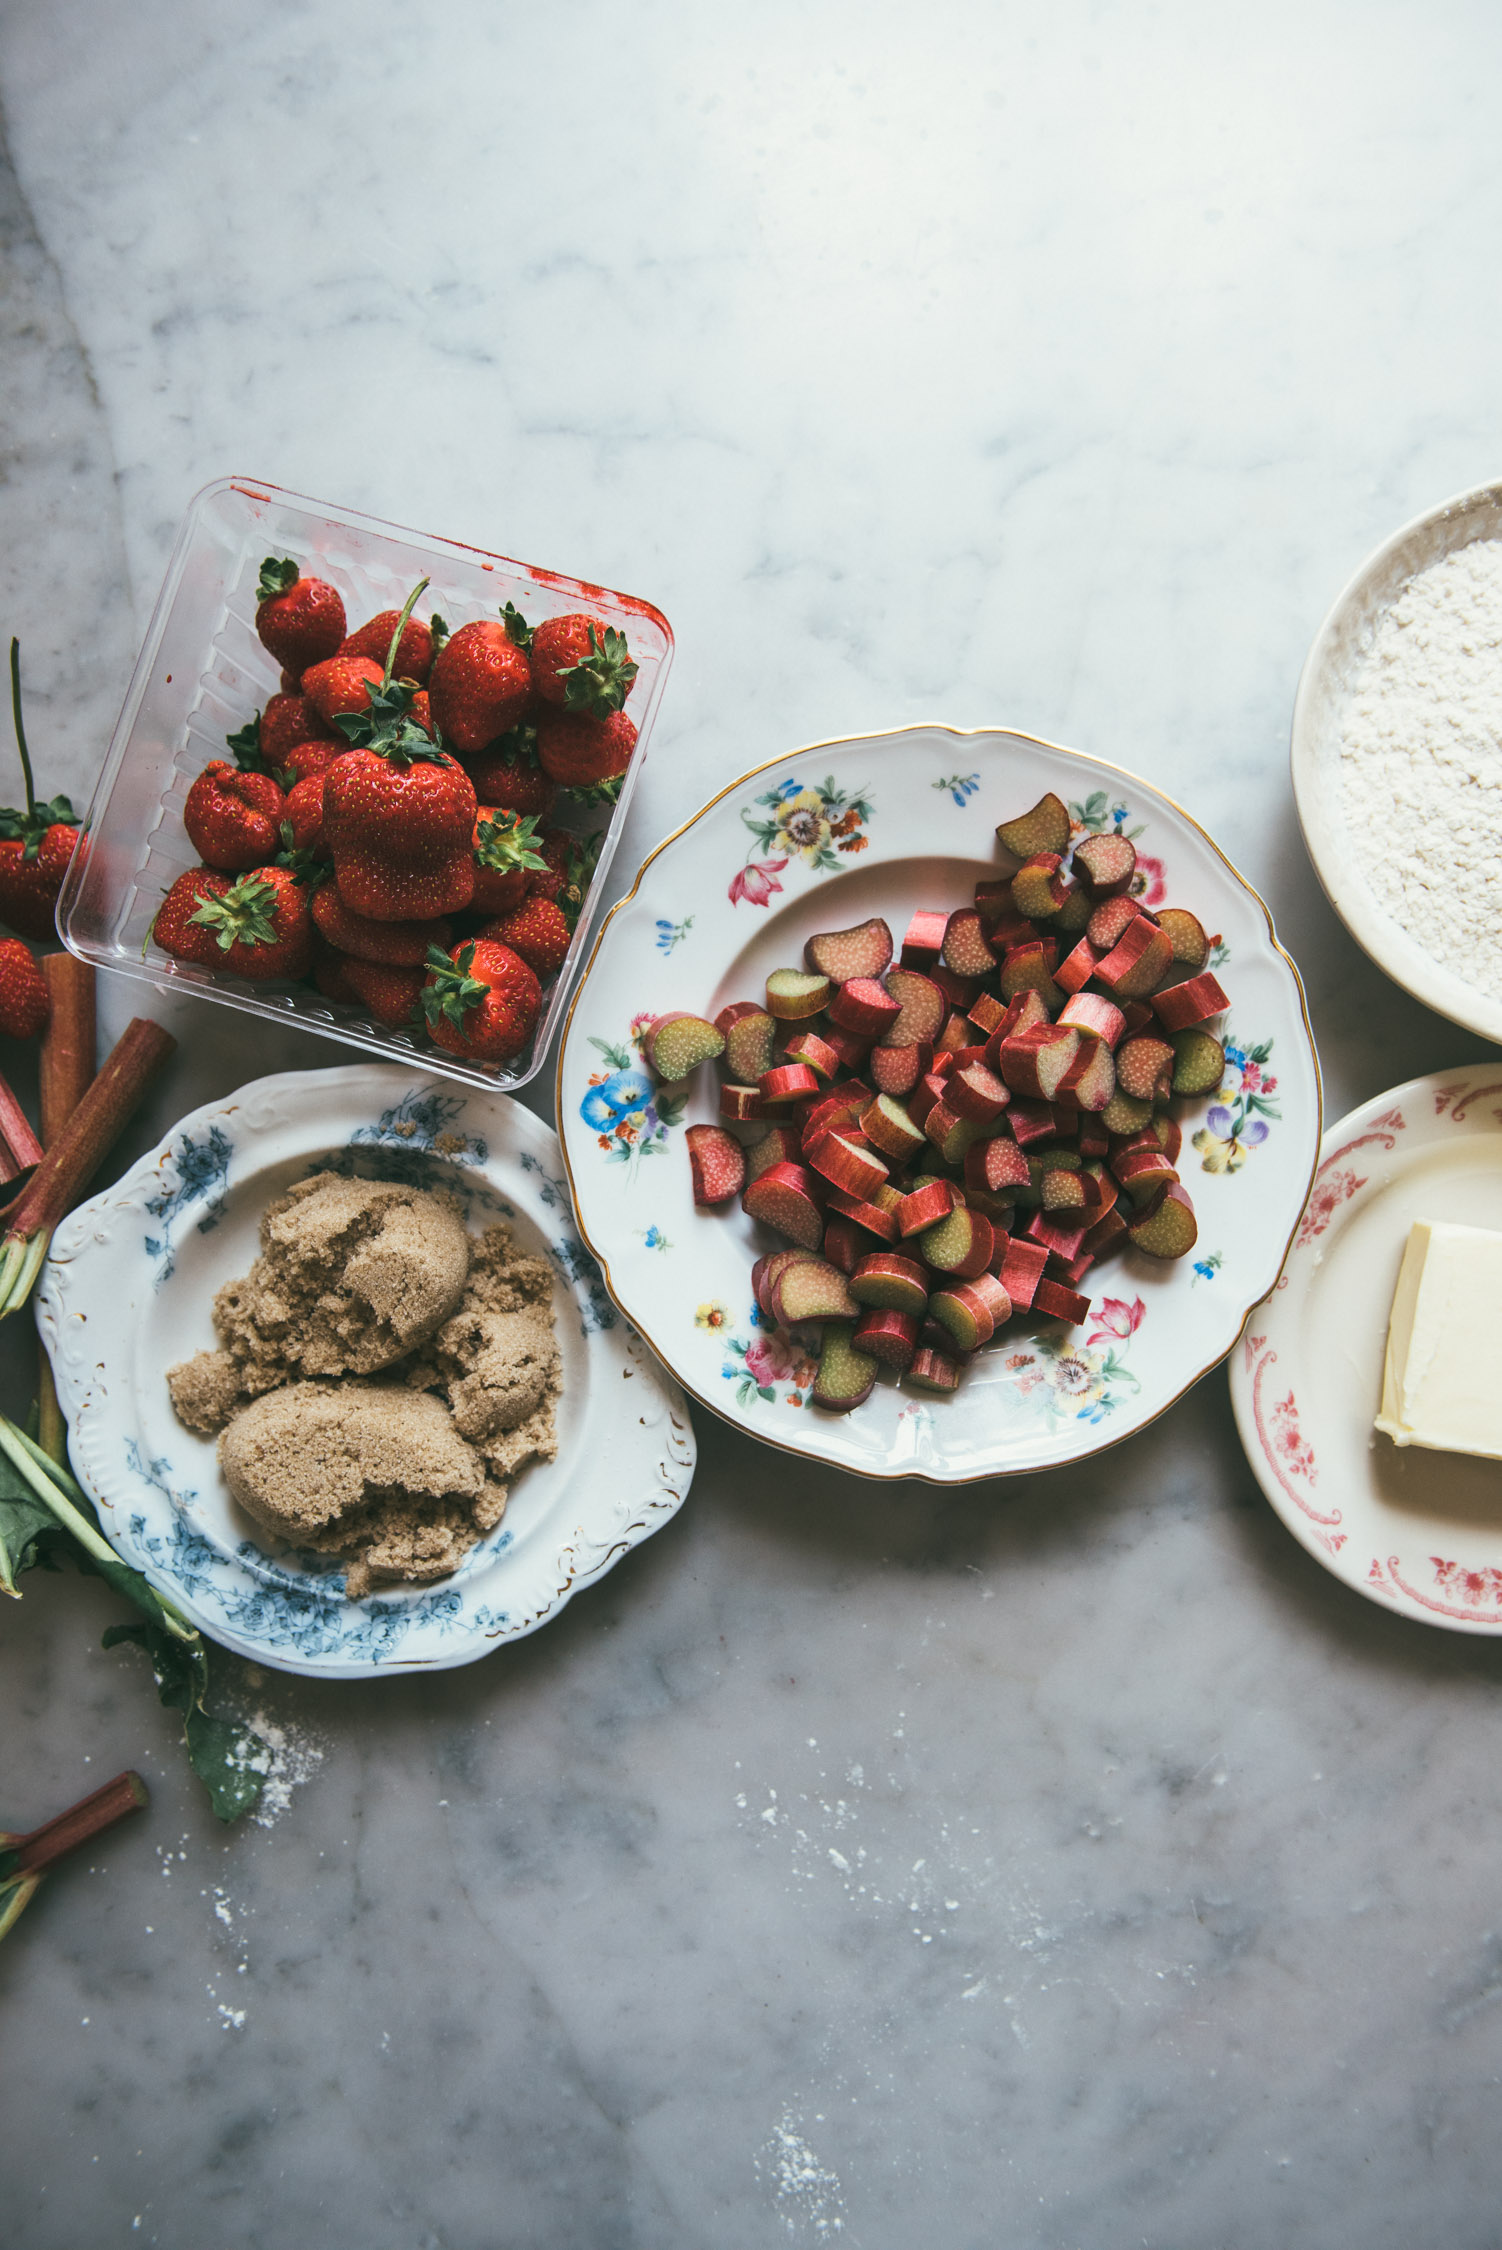 Strawberry Rhubarb Ice Cream Sandwiches